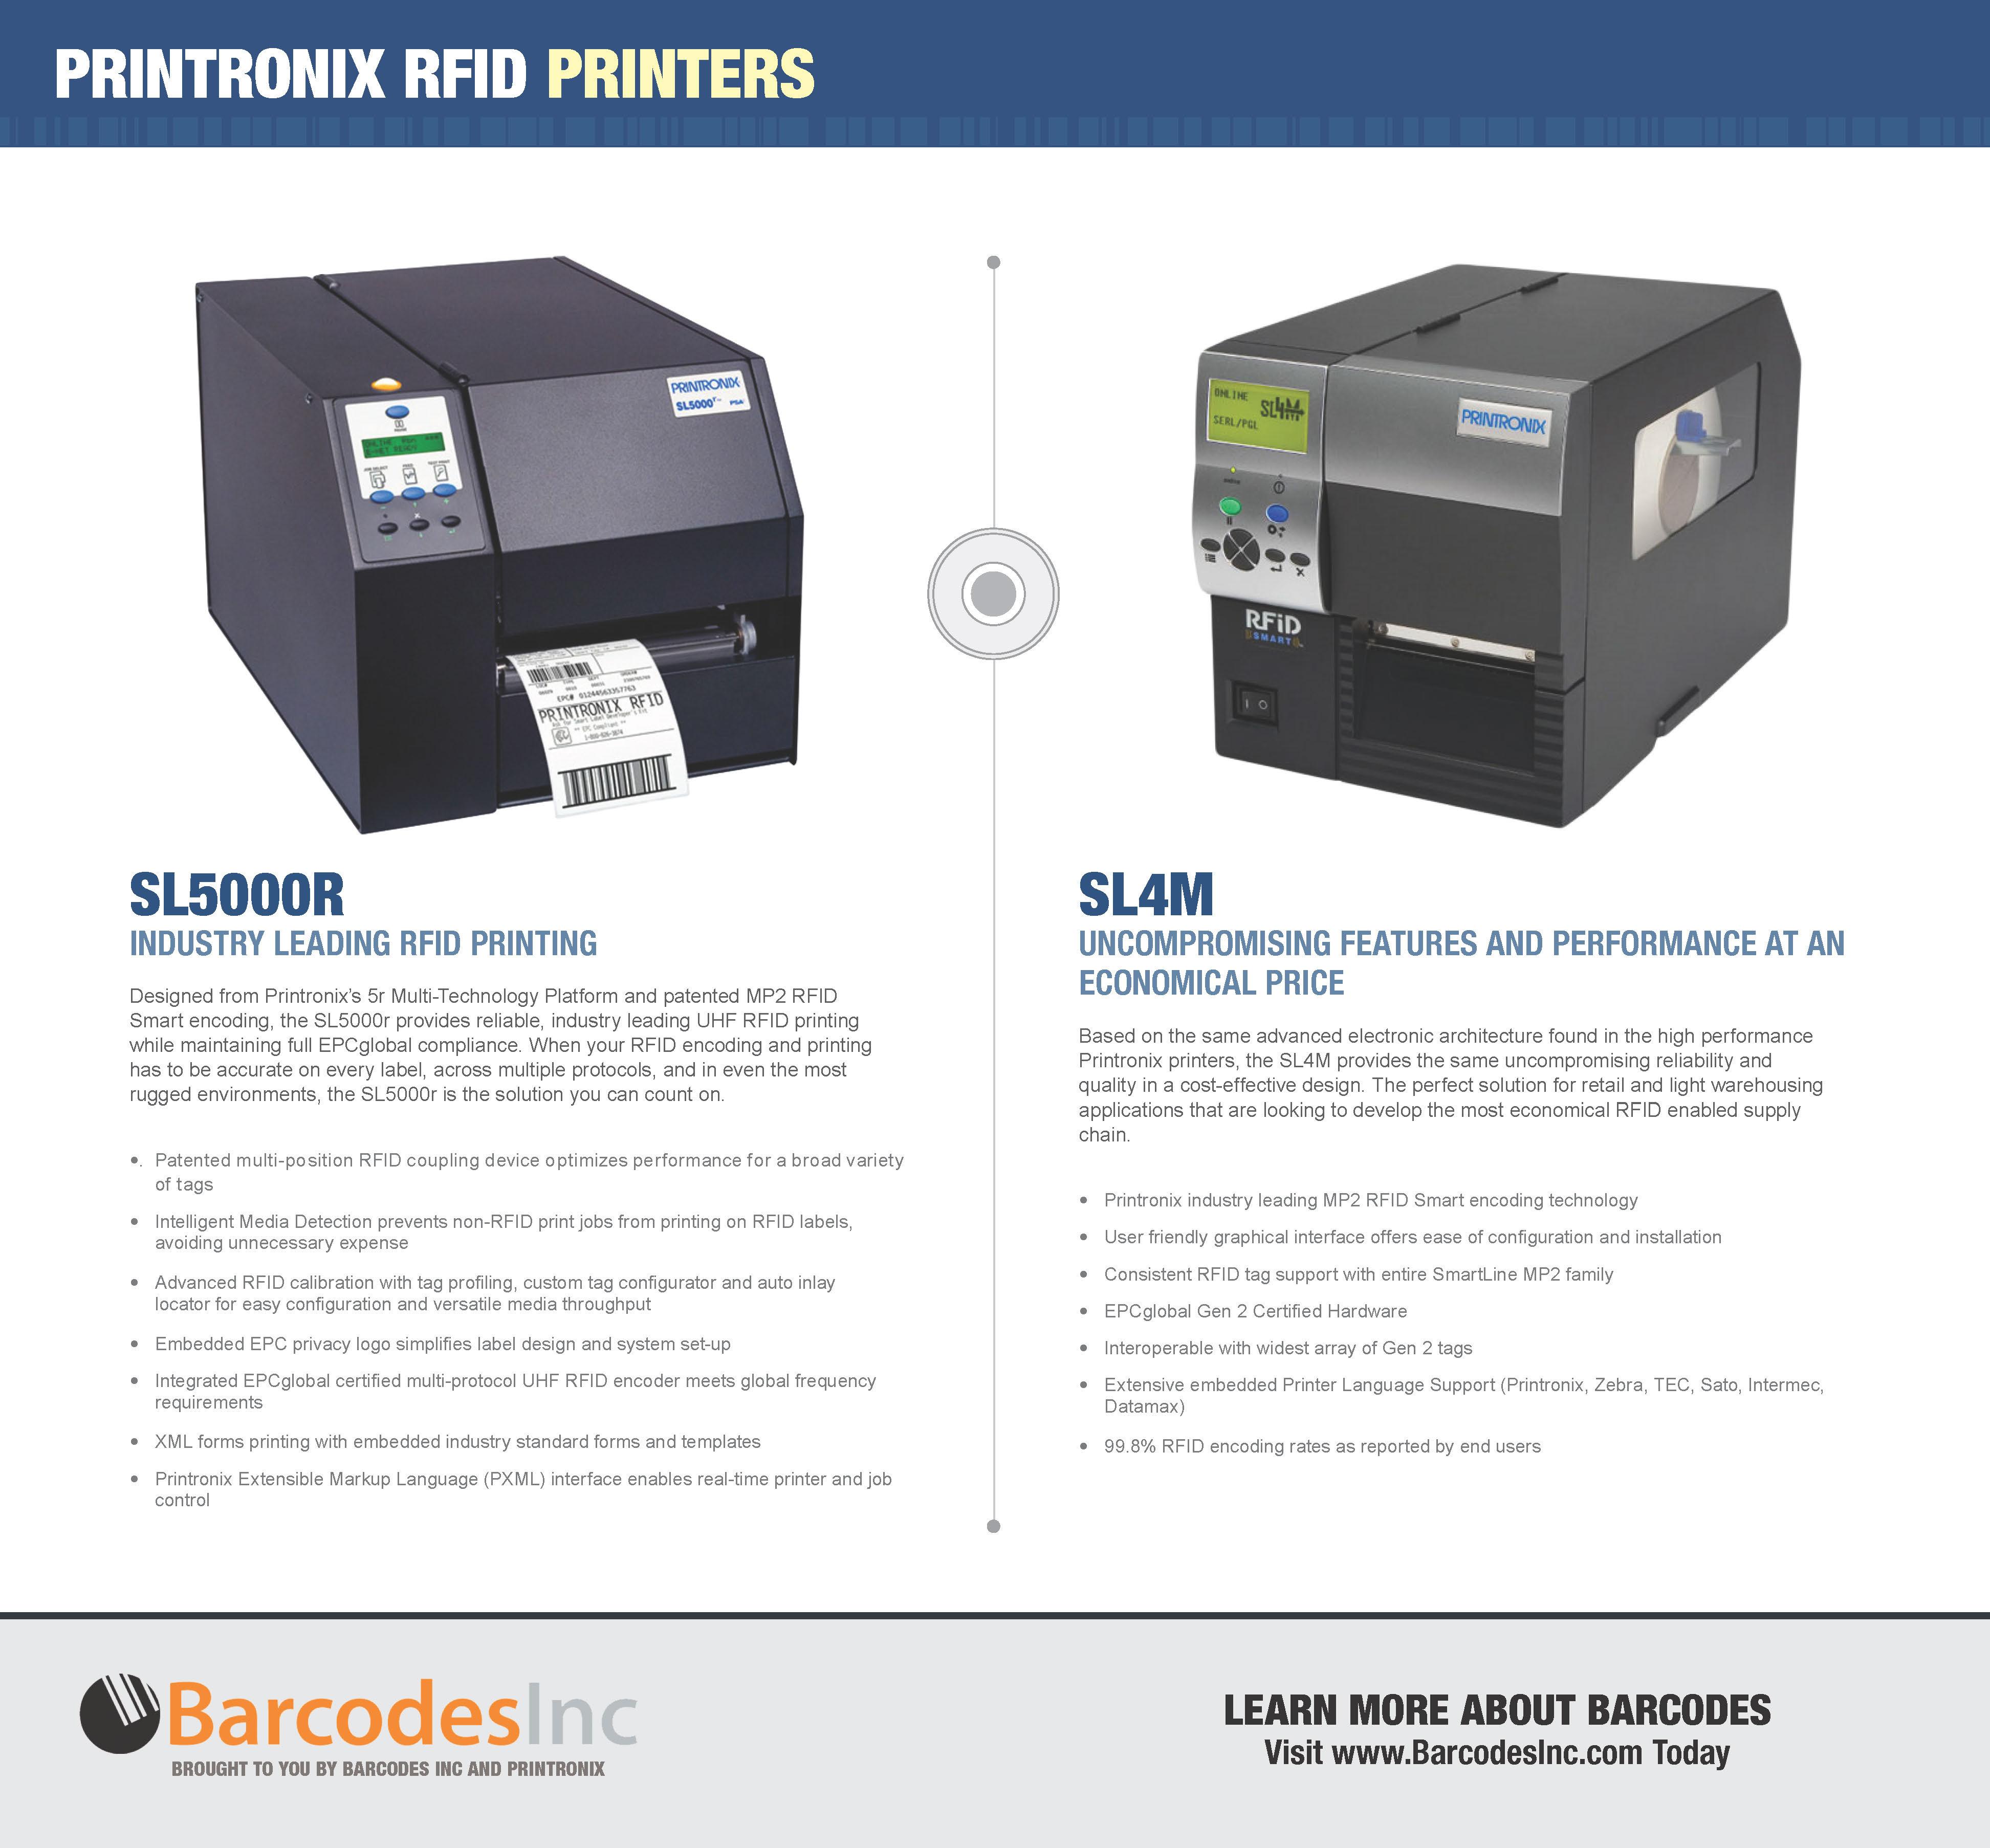 Printronix RFID Printers